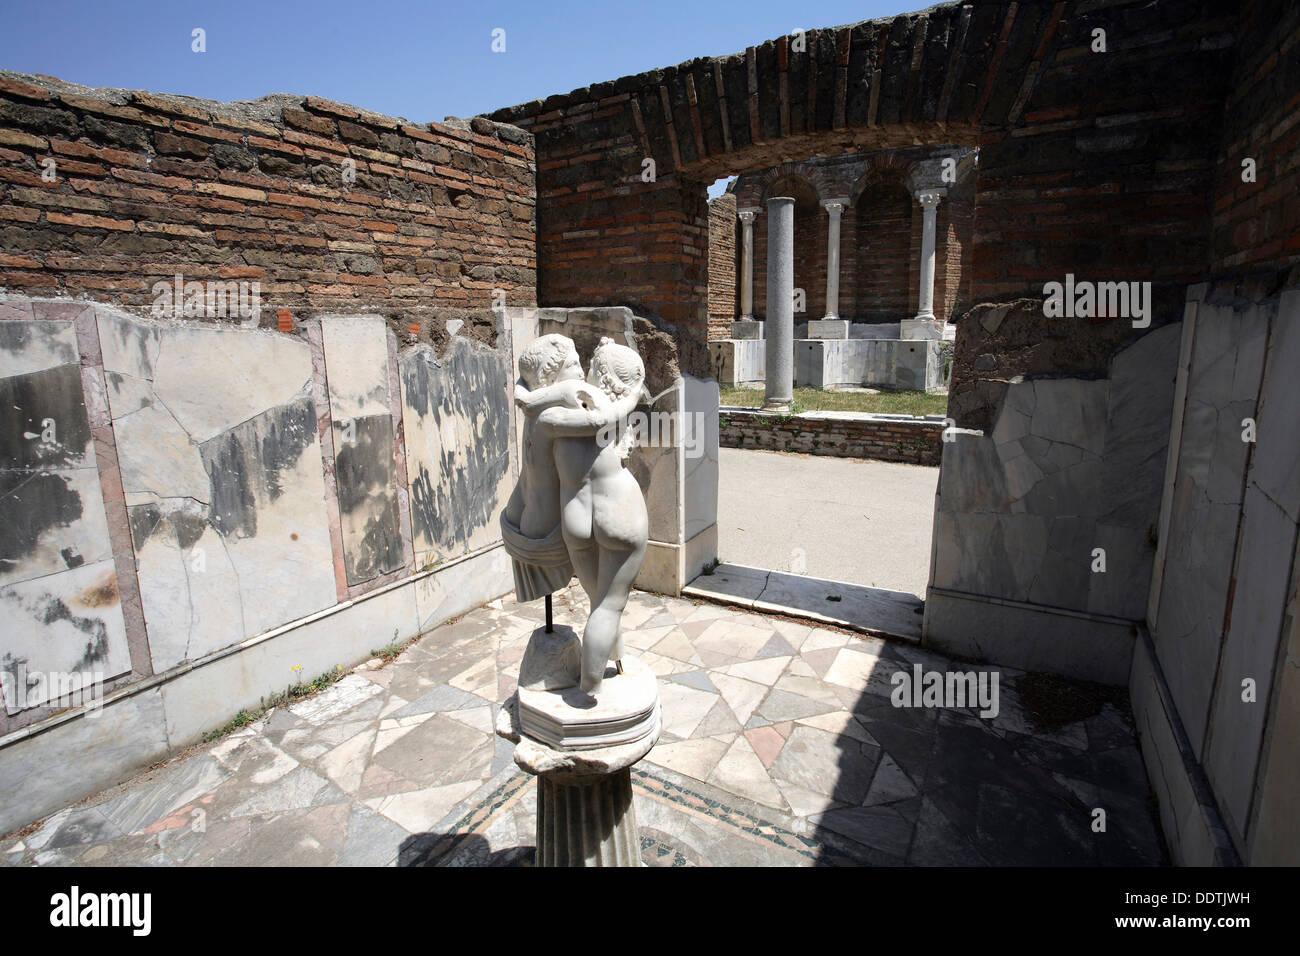 La casa de Amor y Psique, Ostia Antica, Italia. Artista: Samuel Magal Imagen De Stock